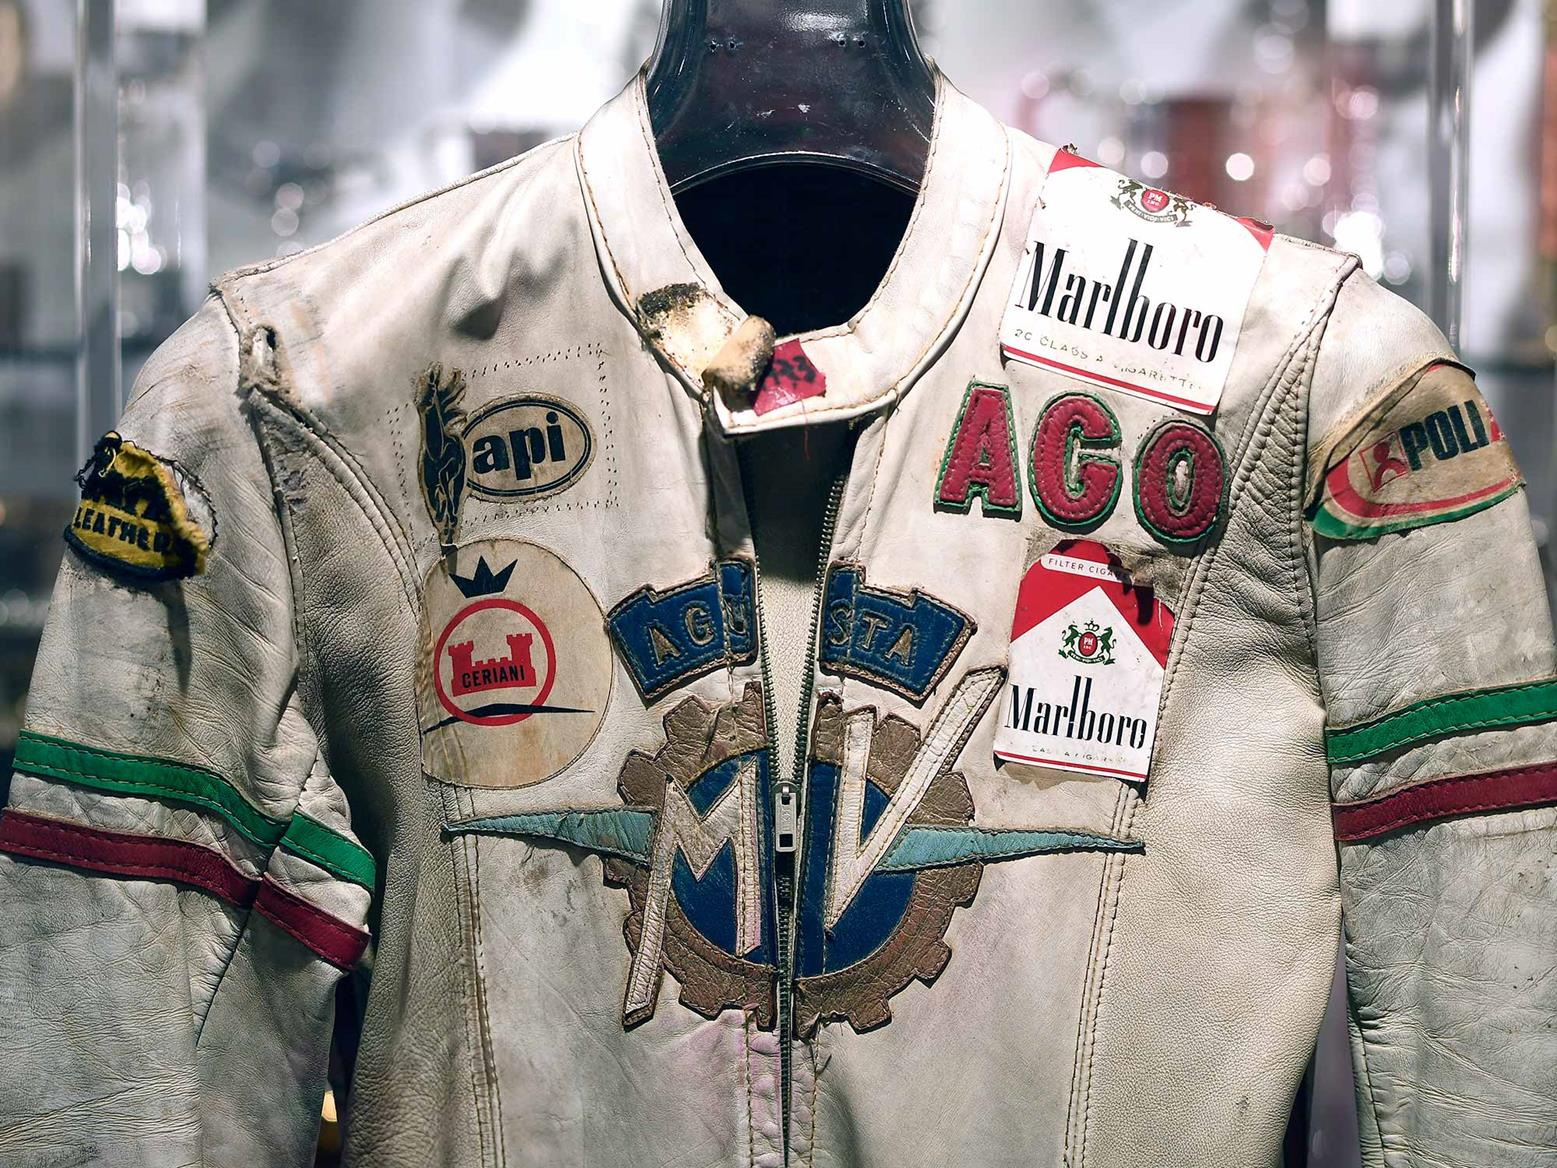 Classic Giacomo Agostini racing leathers